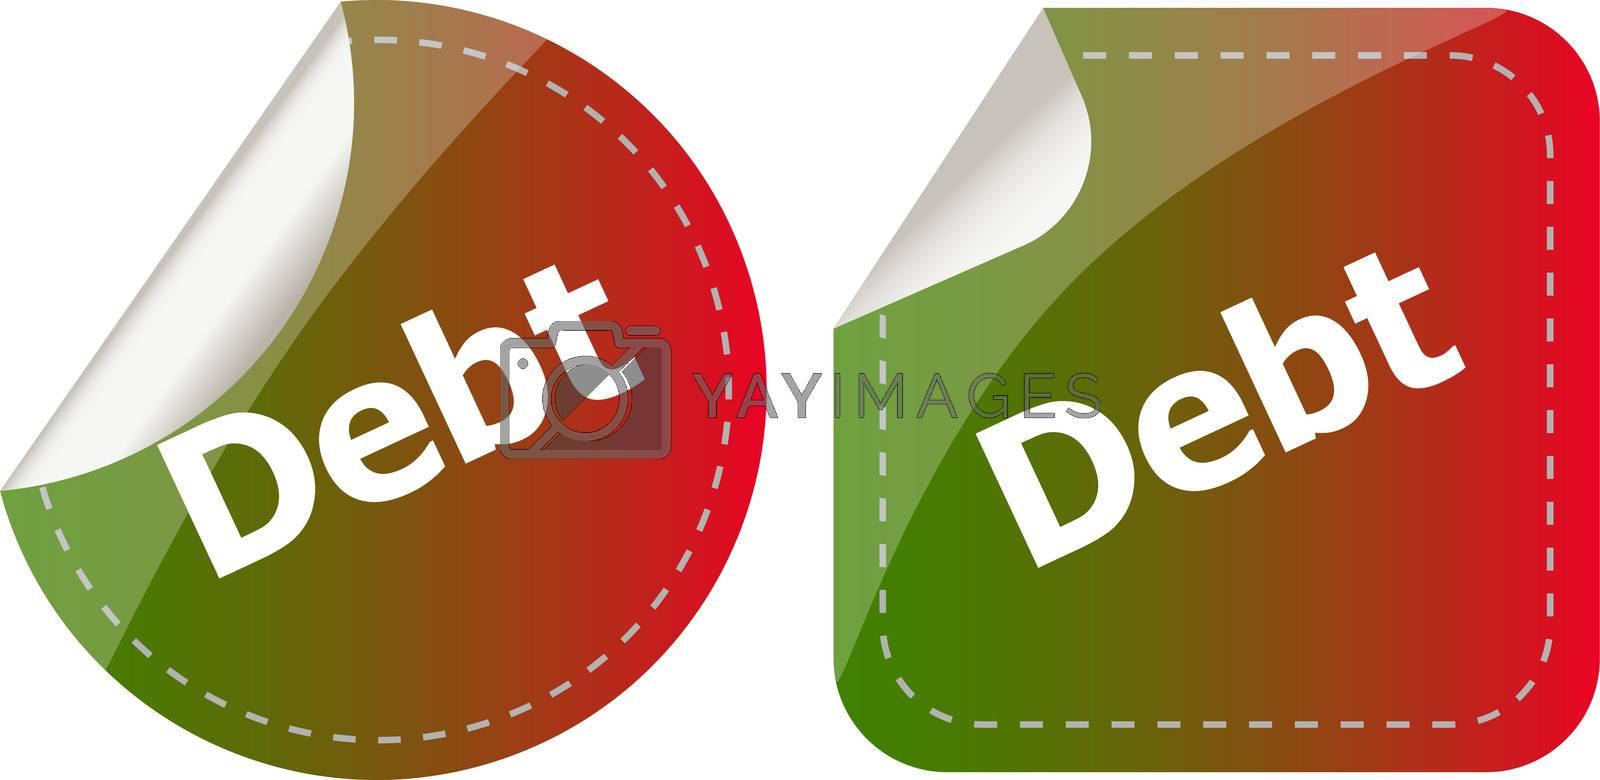 derb word on stickers button set, business label